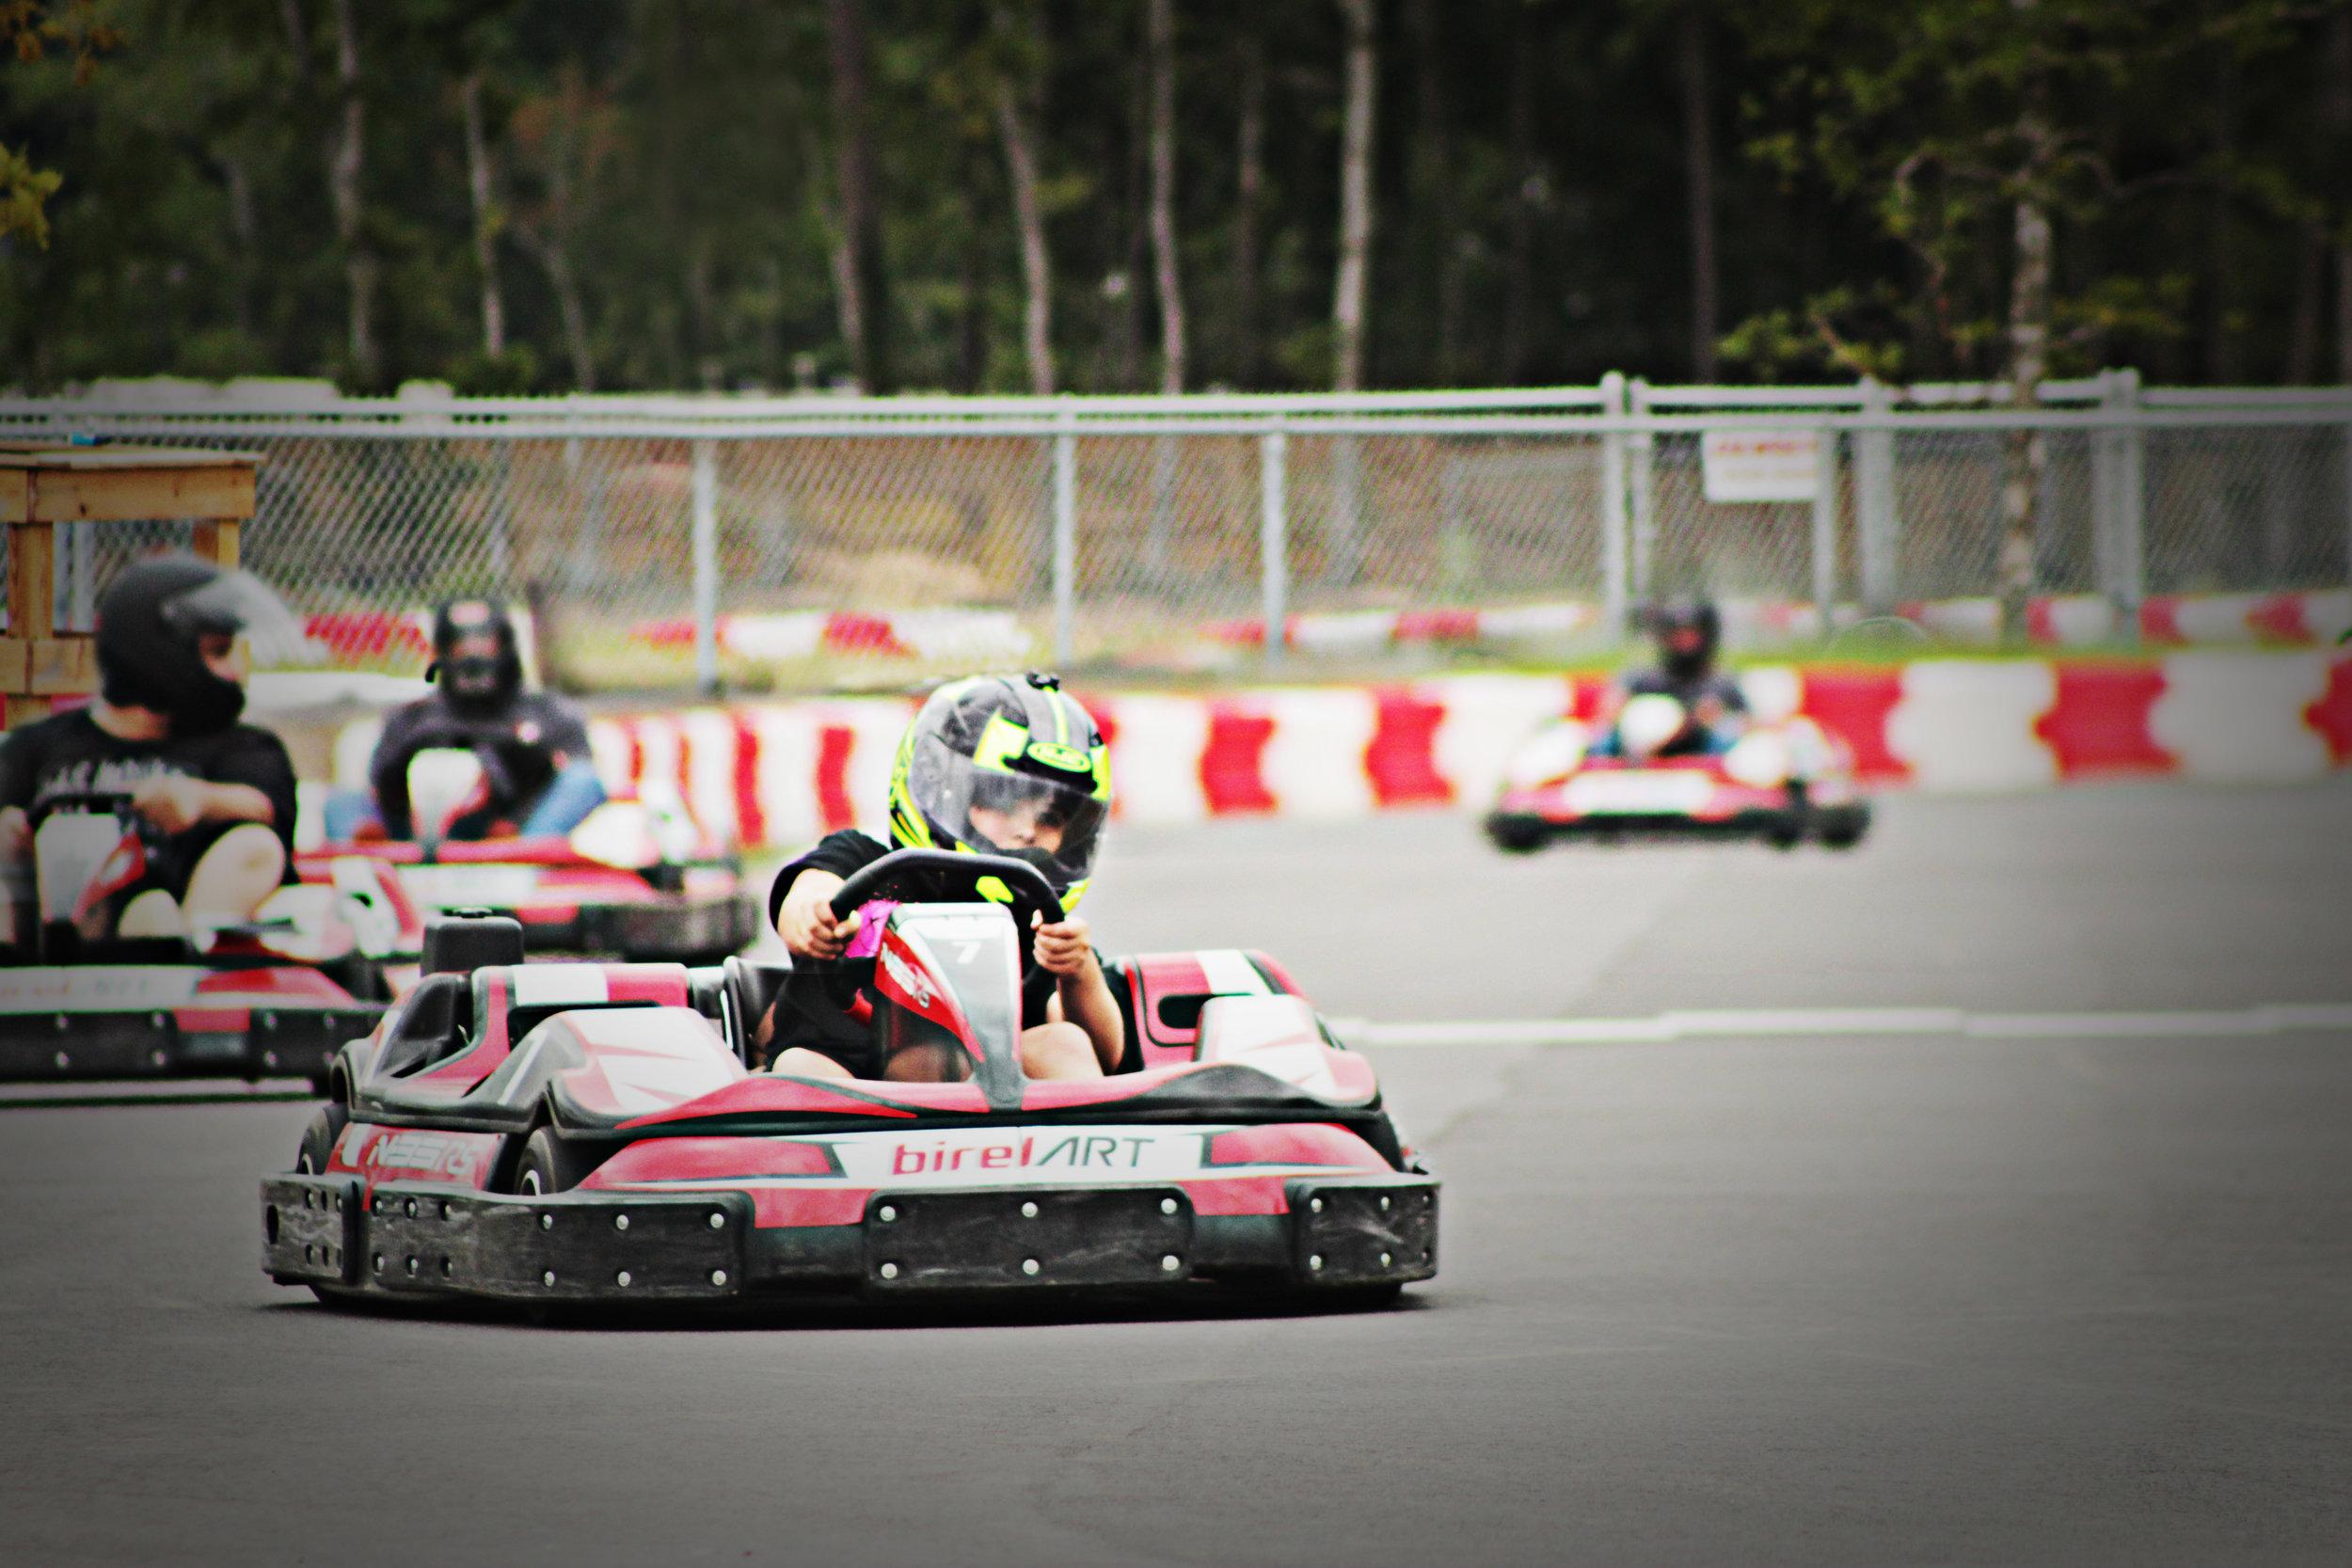 Seth Salyer - Speedsportz-League Races (109)-Edited.jpg